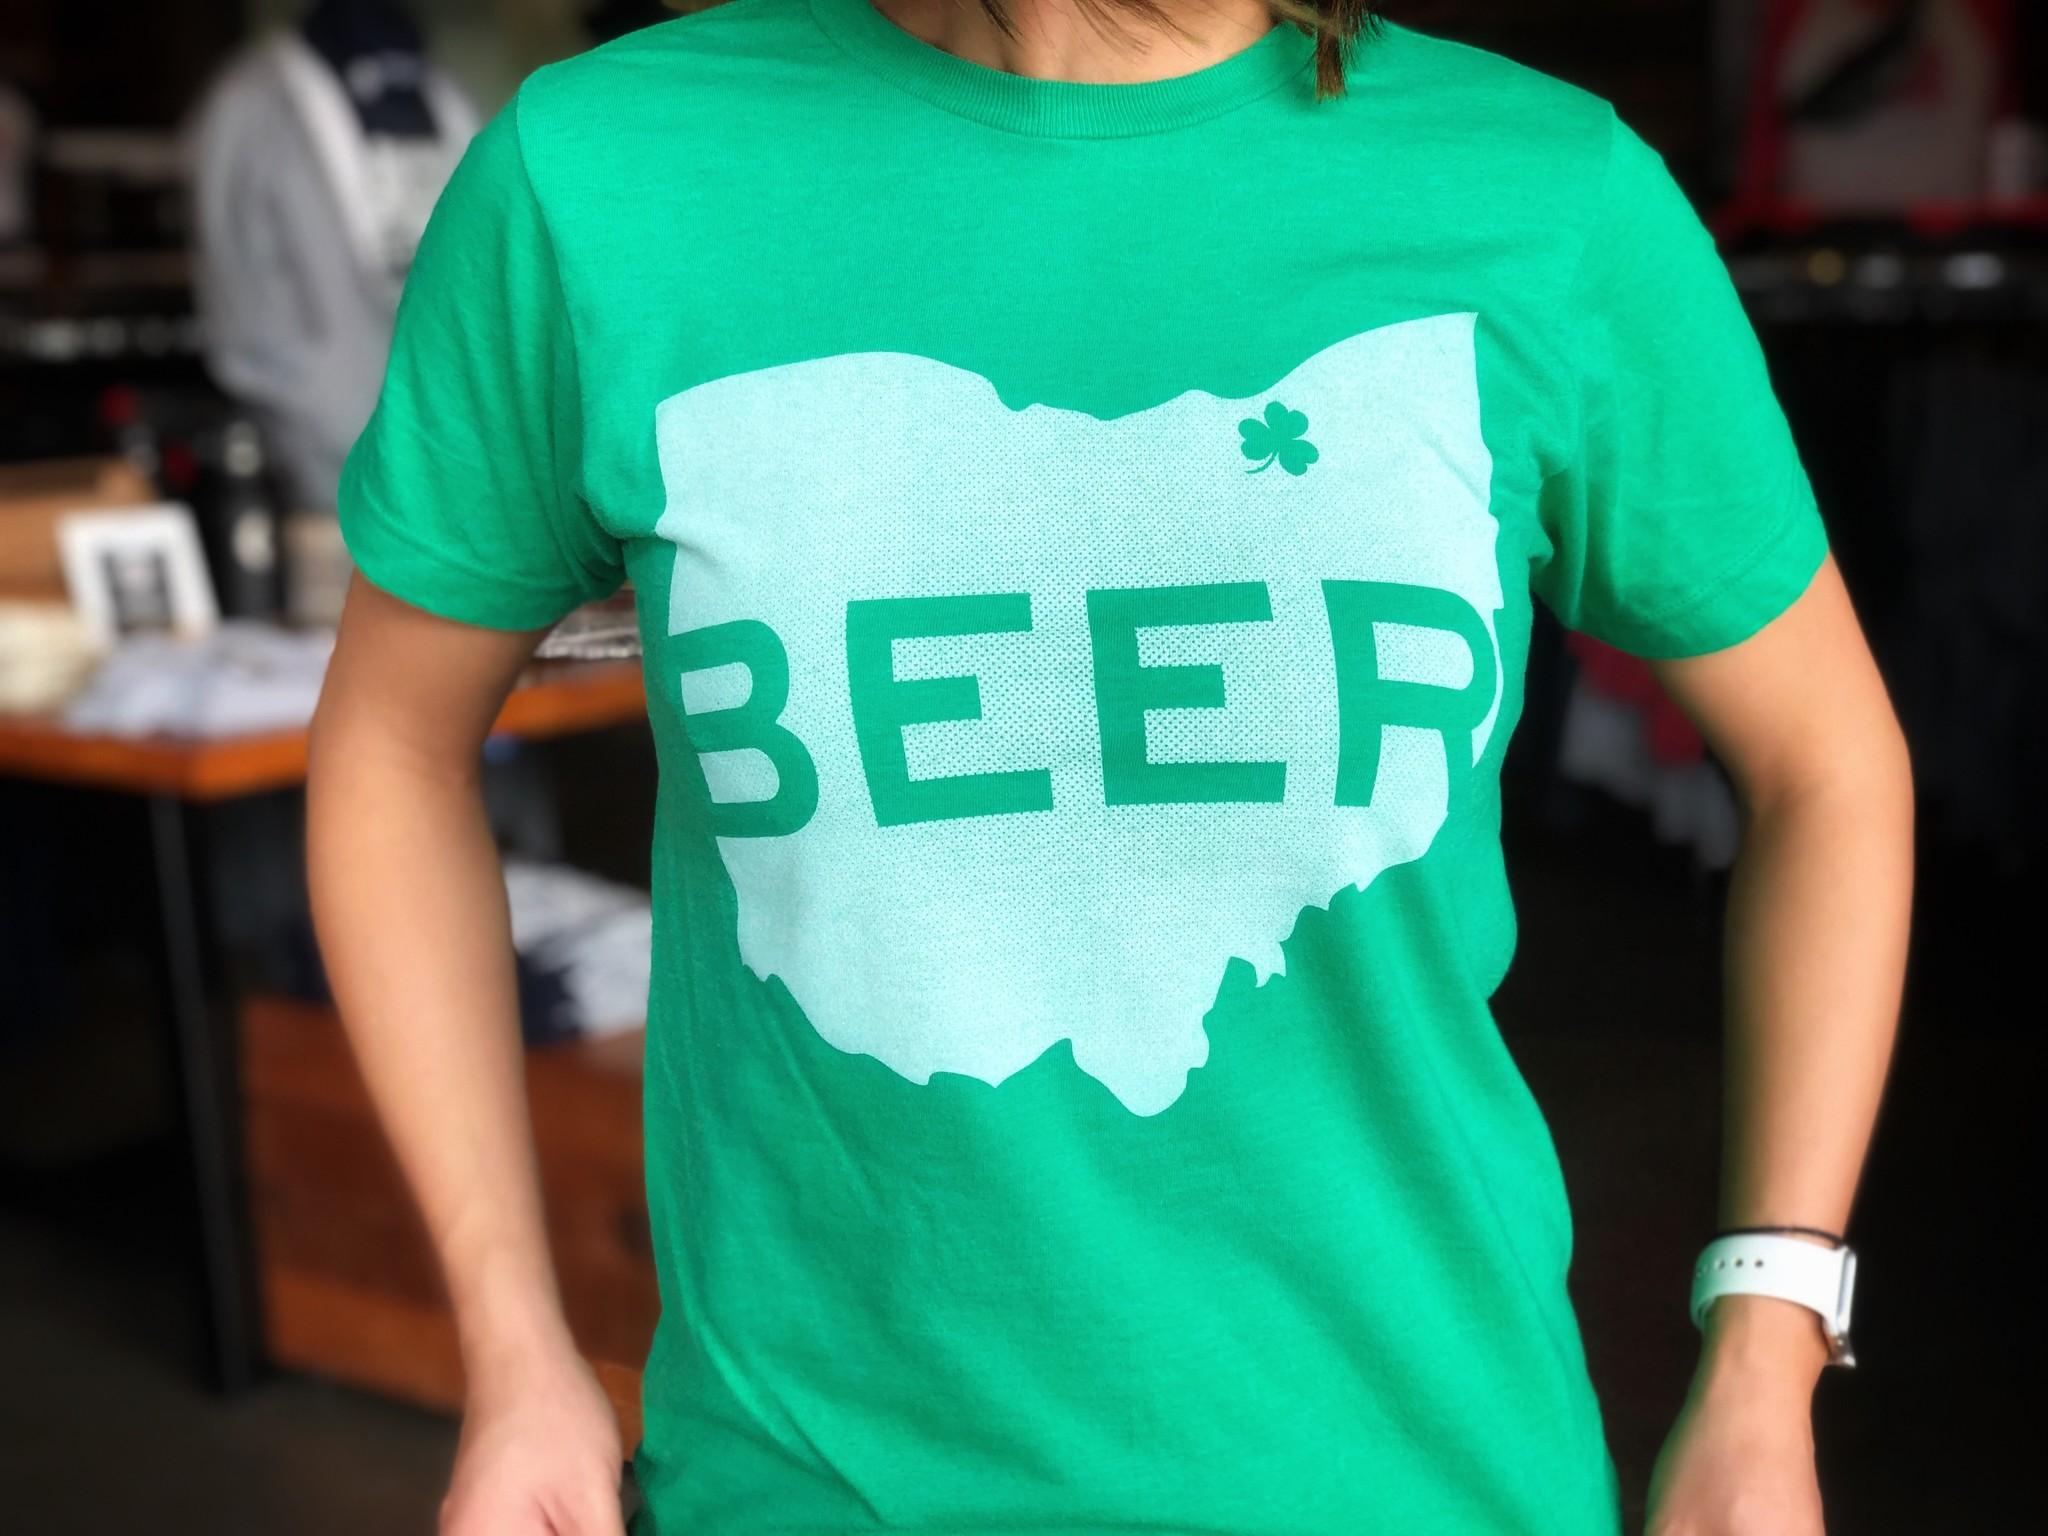 St. Patrick's Beerhio T-Shirt